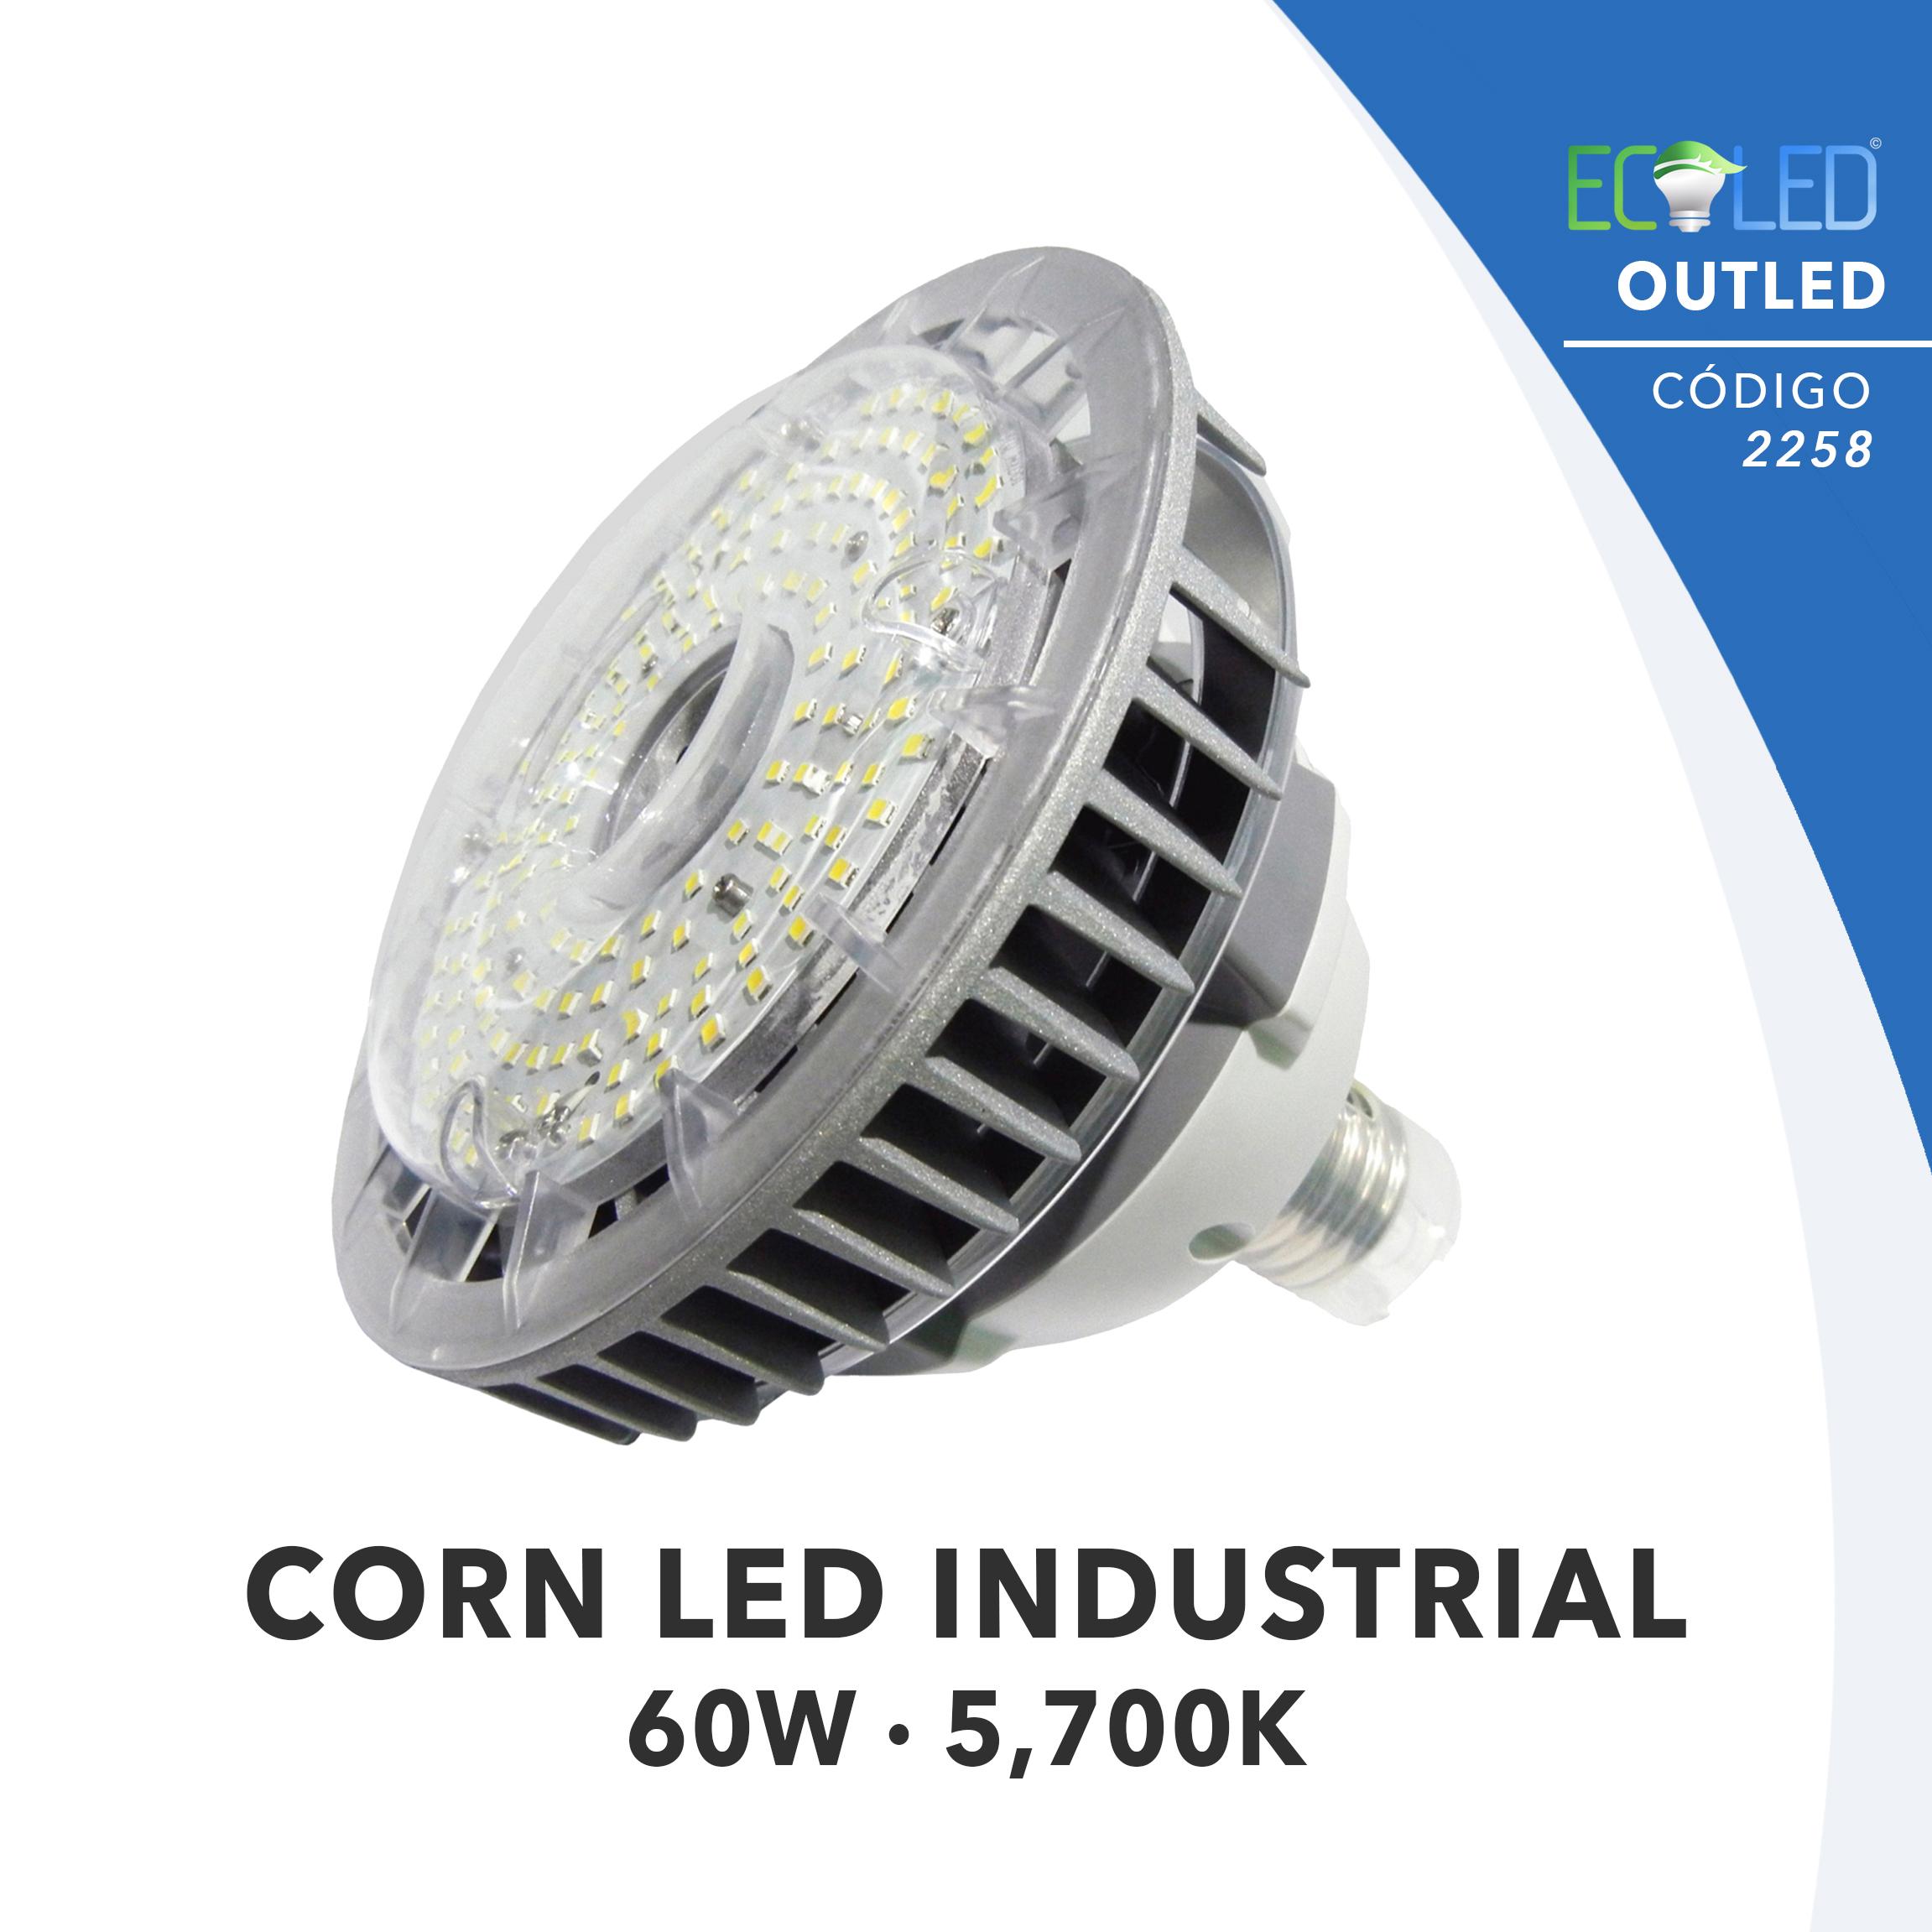 2258 · CORN LED INDUSTRIAL-60W-57K